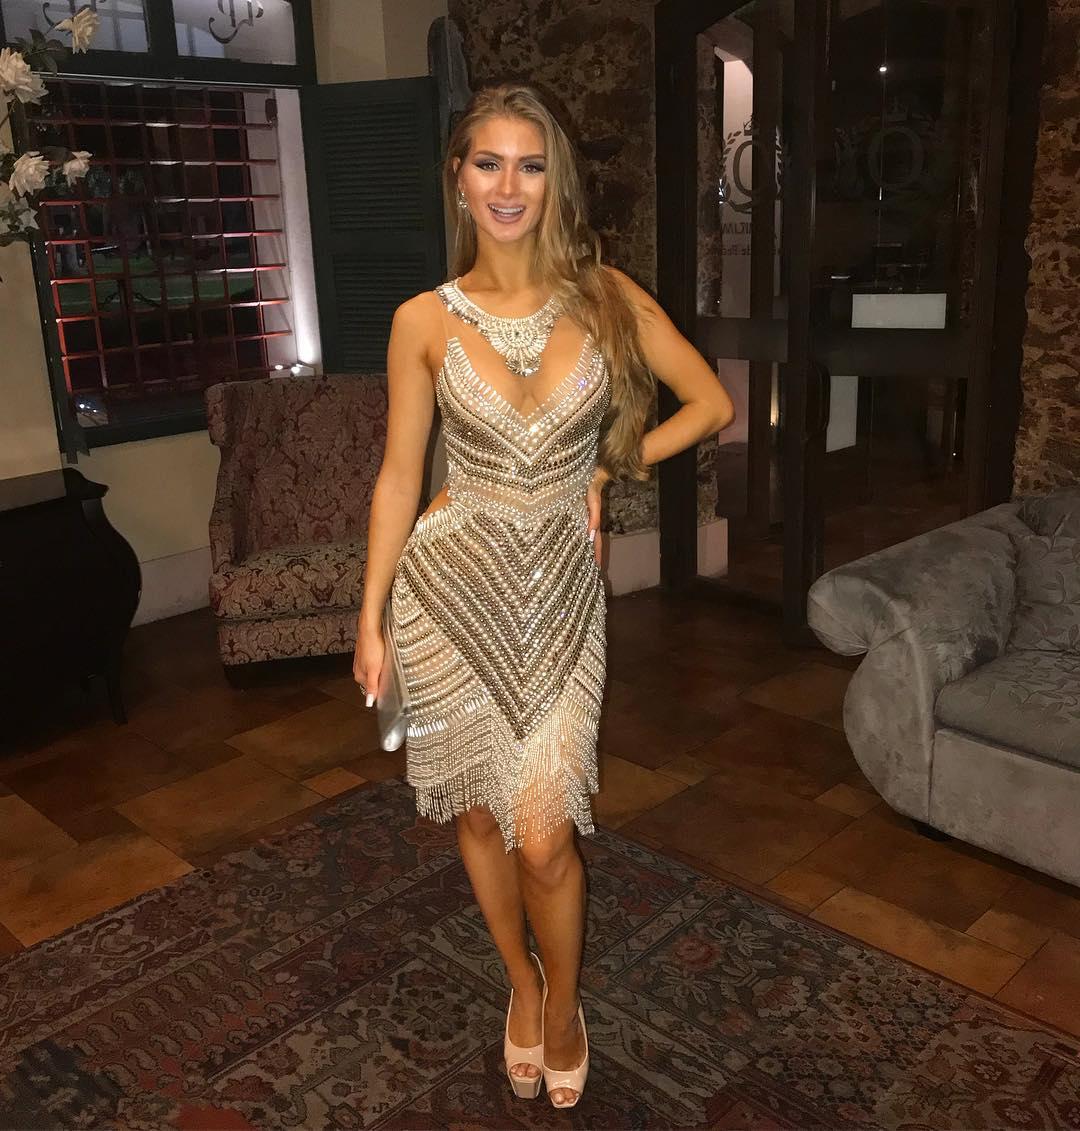 gabriela palma, miss brasil empresarial 2018. - Página 3 37774110